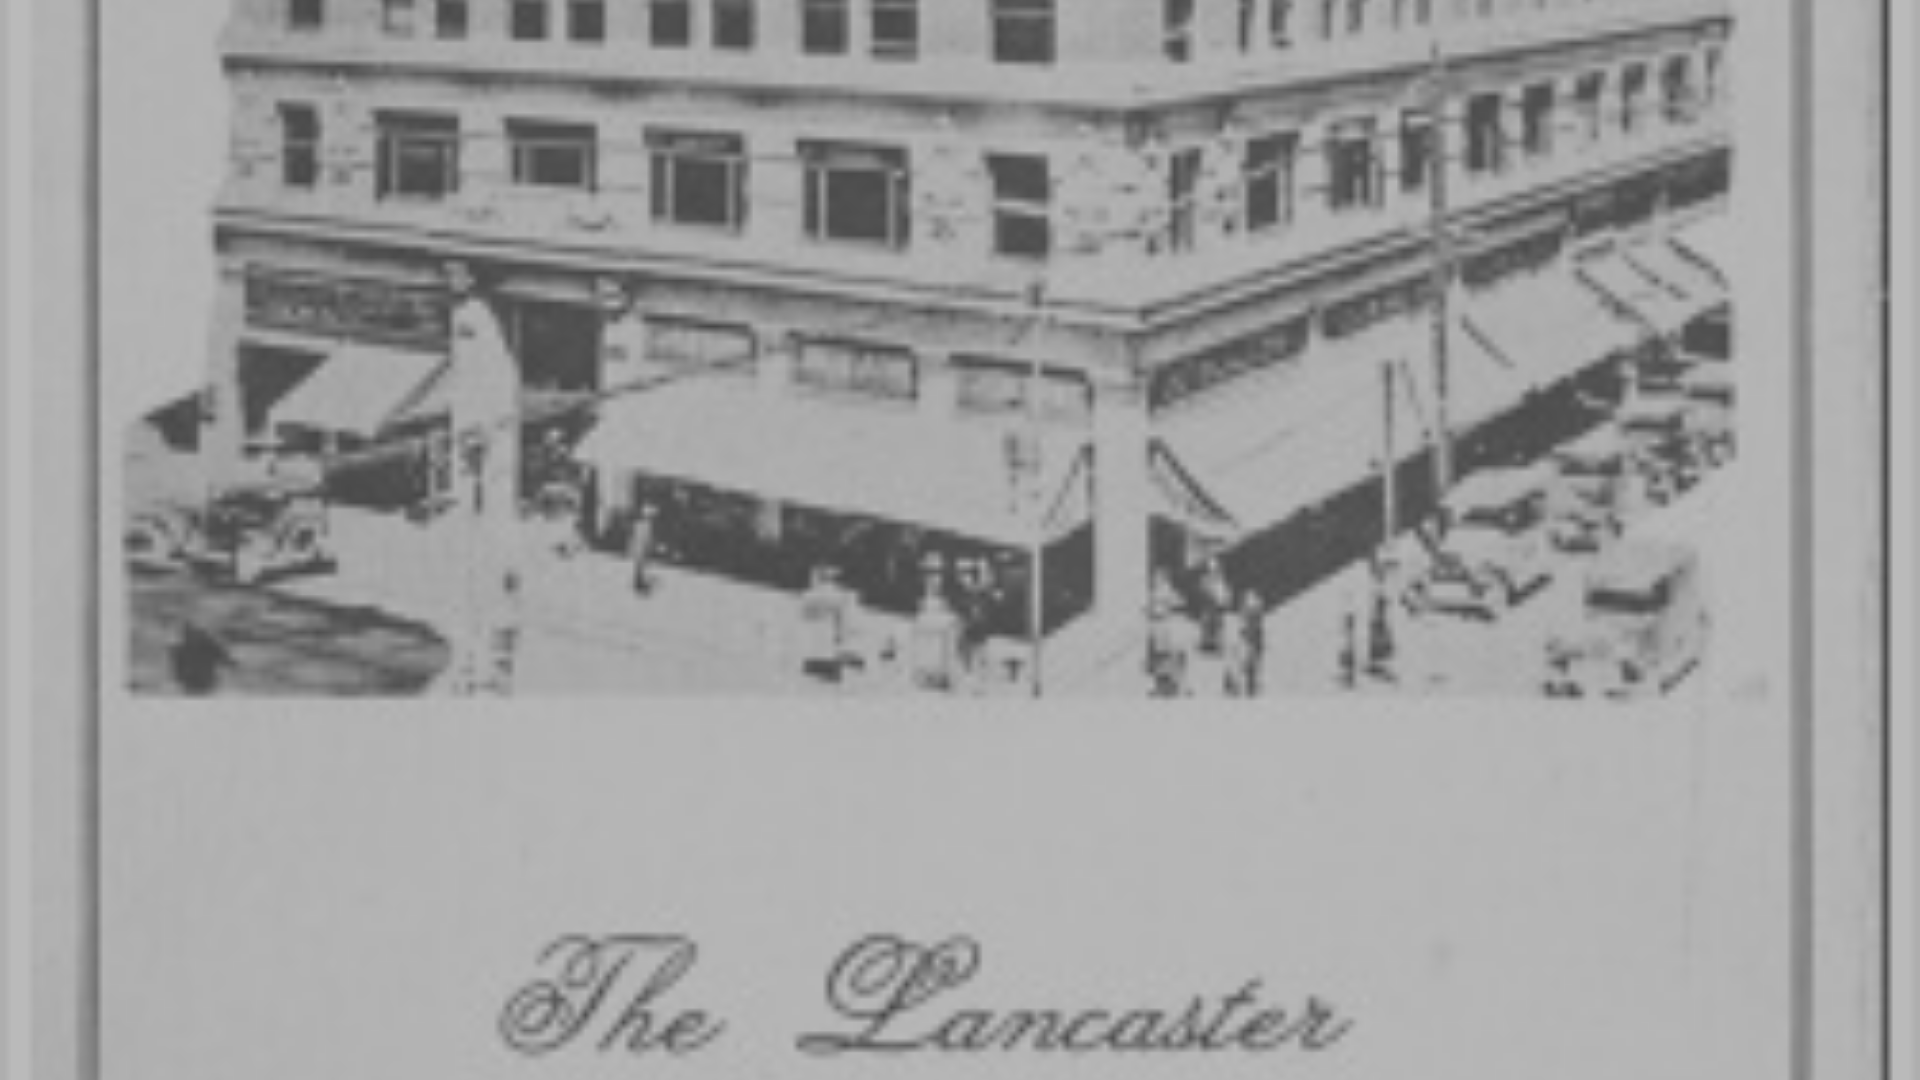 The Lancaster Building